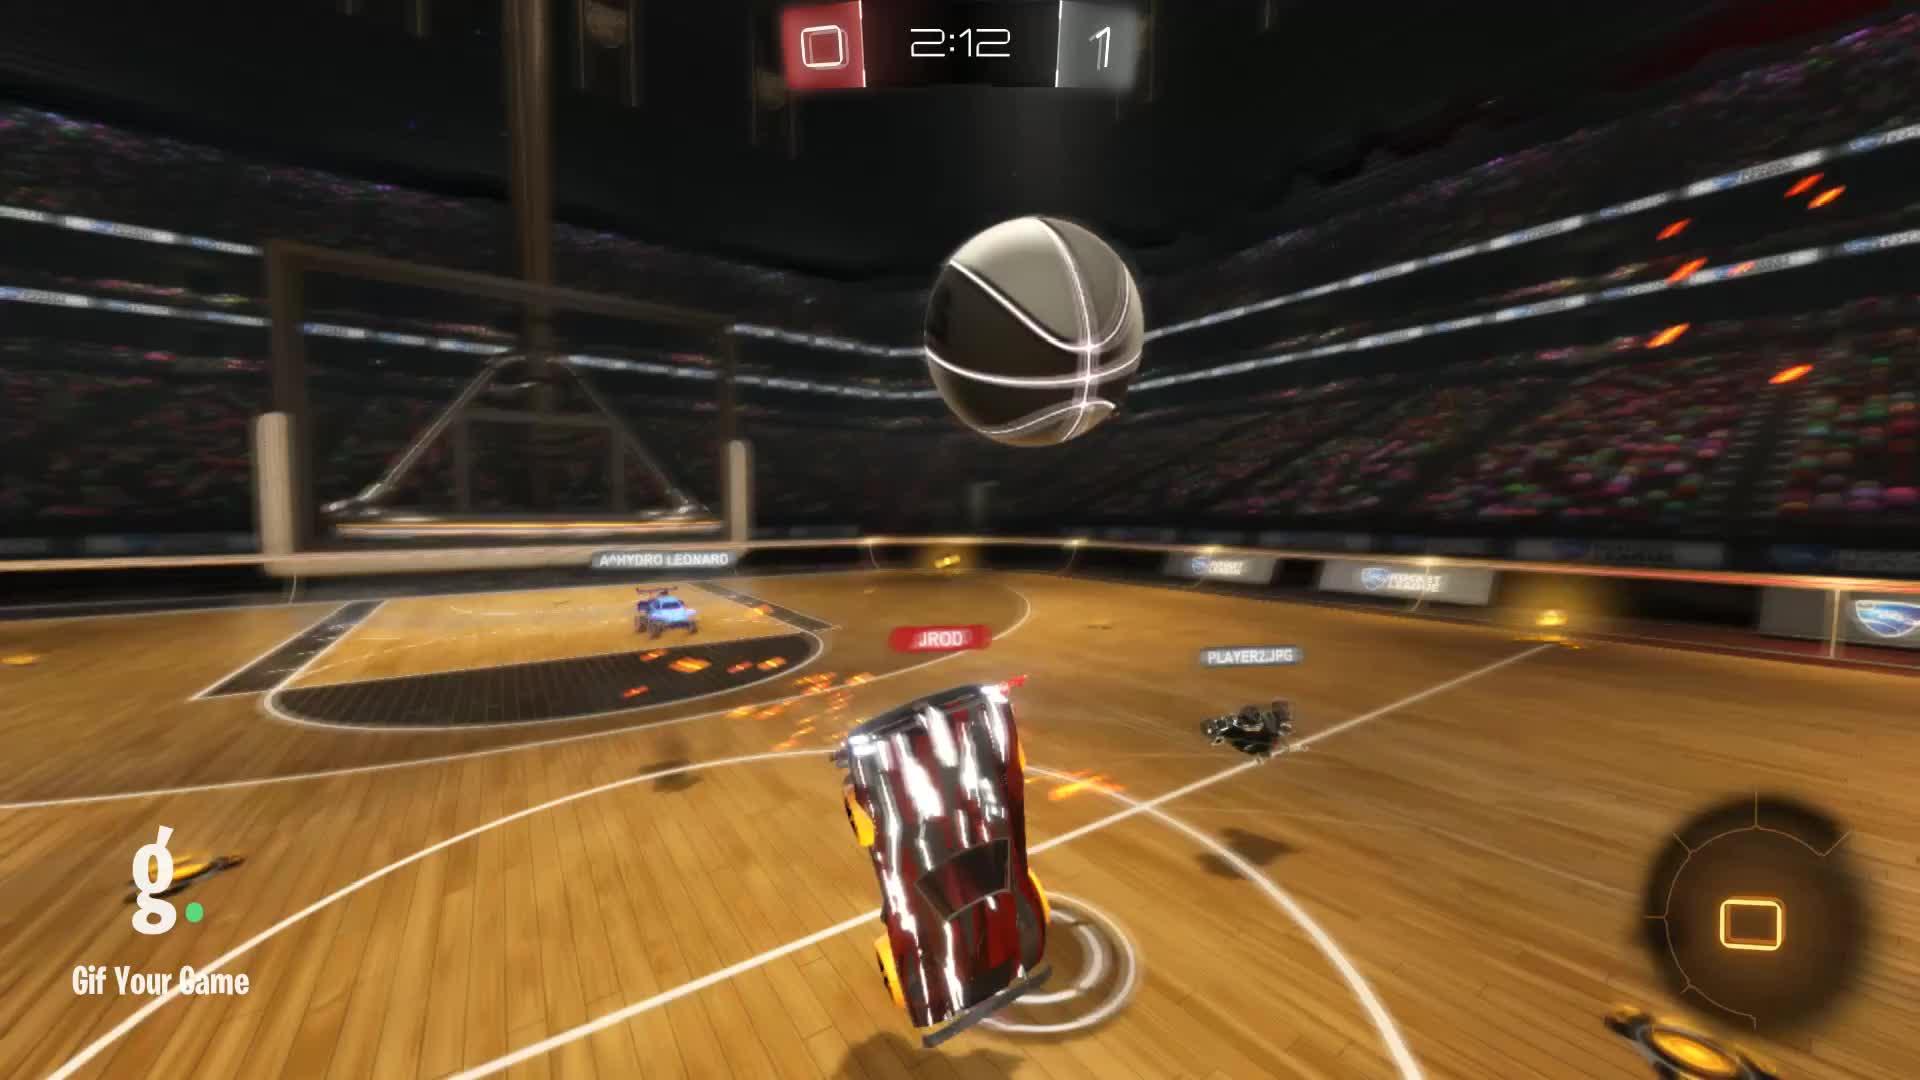 Gif Your Game, GifYourGame, HeavyUmlaut, Rocket League, RocketLeague, A careful balancing act GIFs